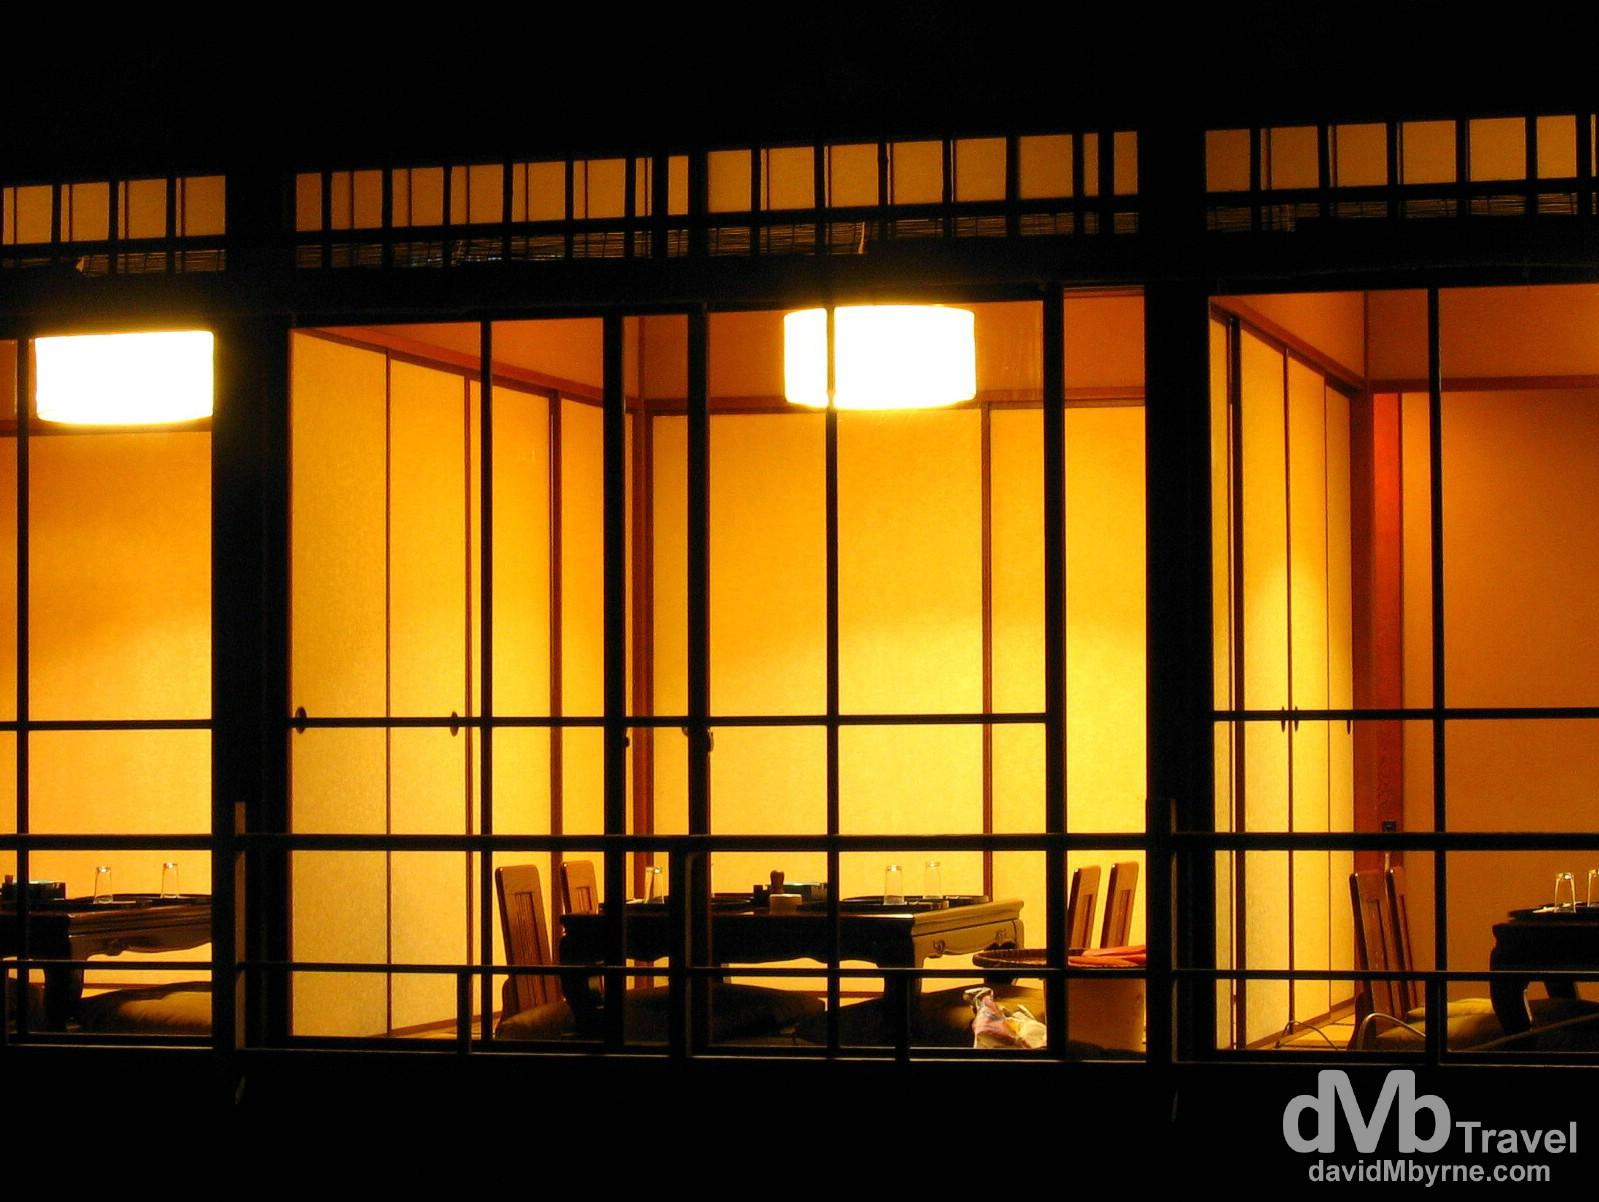 Gion, Kyoto, Japan. November 20th, 2007.